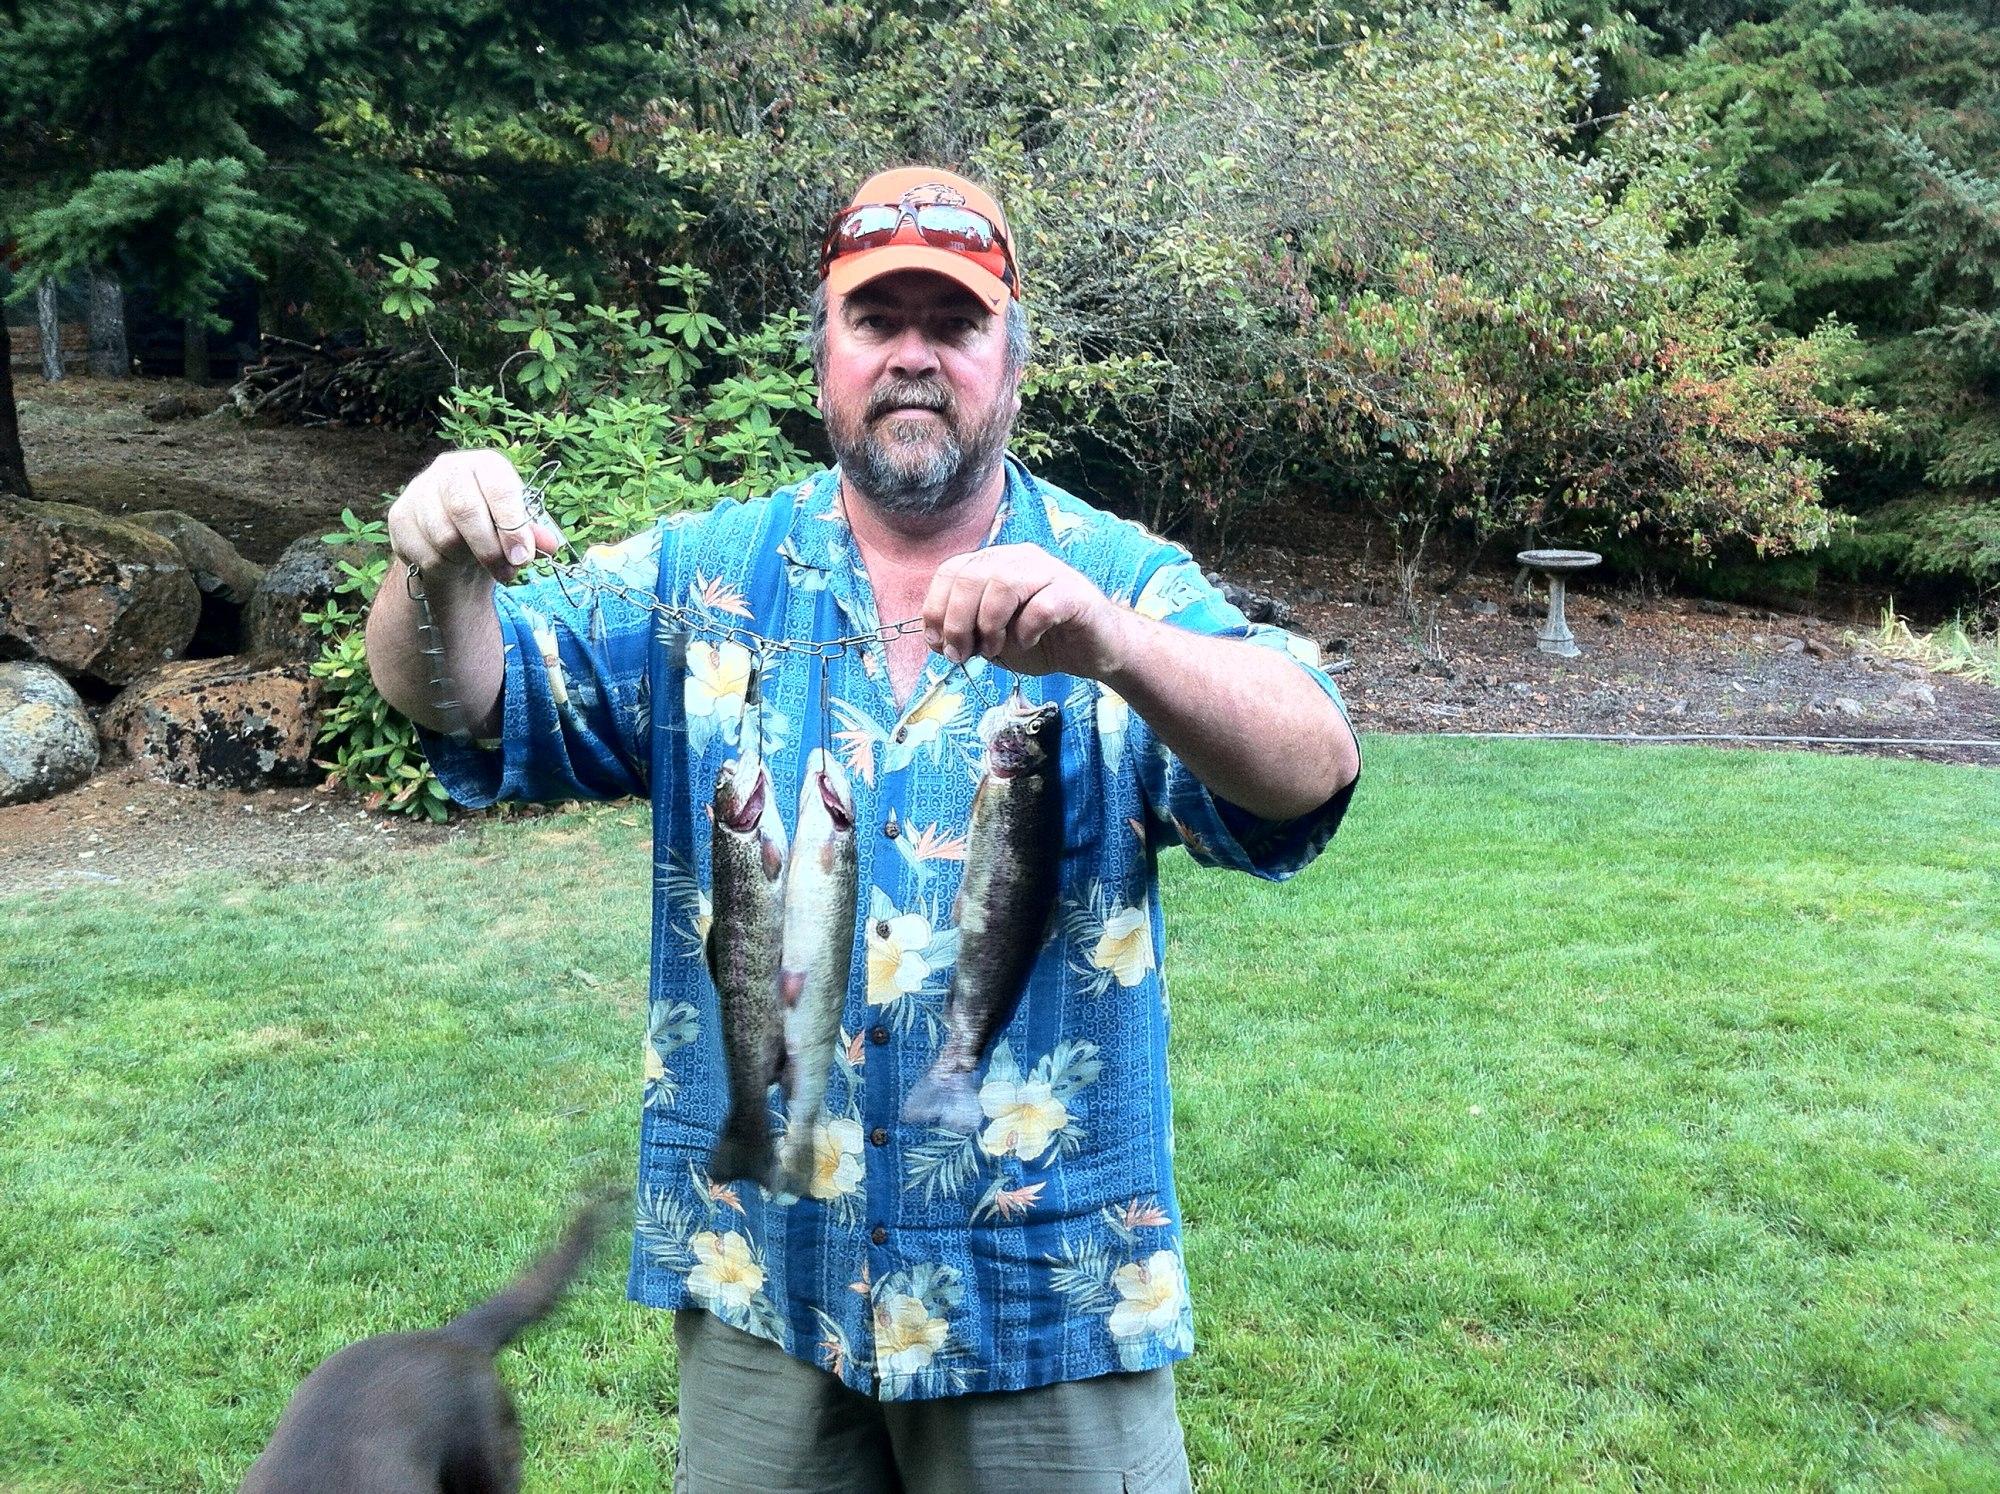 Angler Brad Halleck & Maurice Halleck: Fish of the Week October 10, 2012